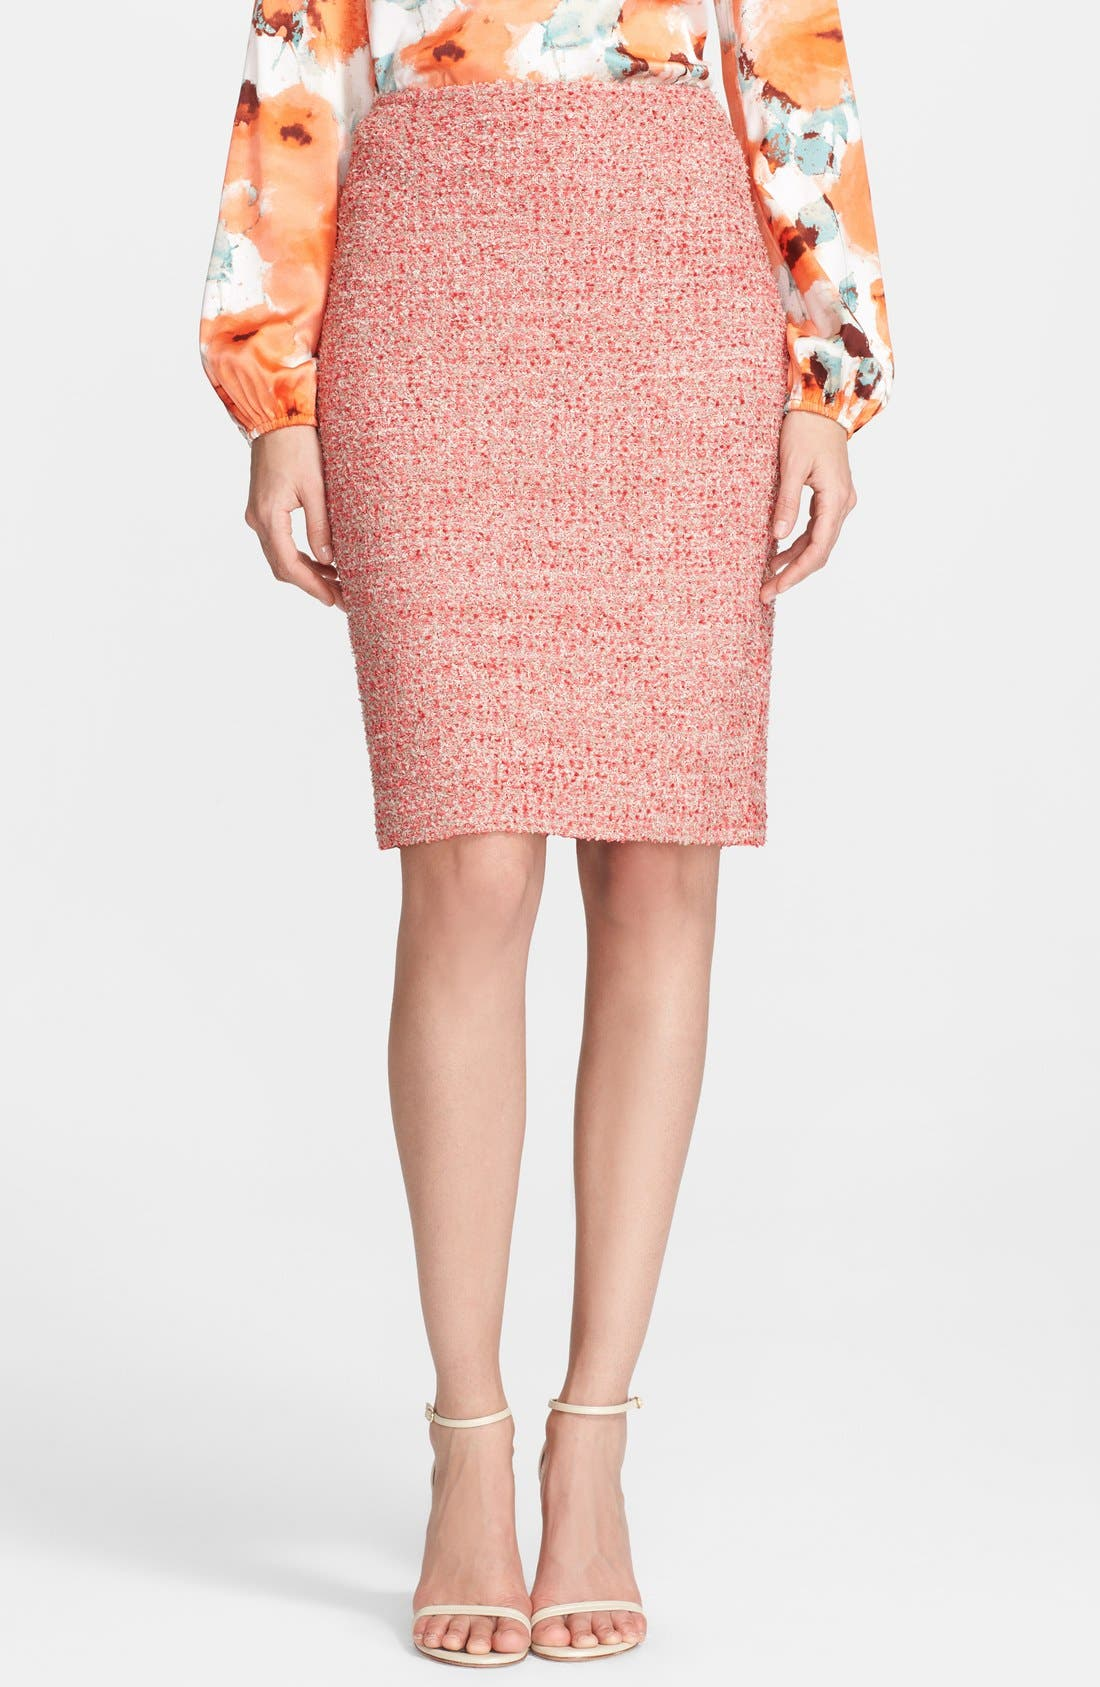 Alternate Image 1 Selected - St. John Collection Eyelash Sparkle Knit Pencil Skirt